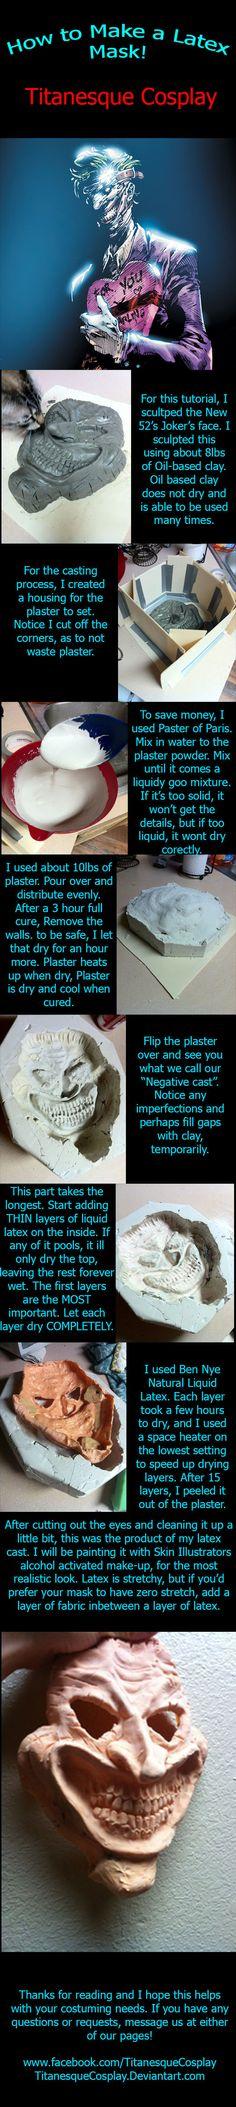 How to Make a Latex Mask by TitanesqueCosplay.deviantart.com on @deviantART